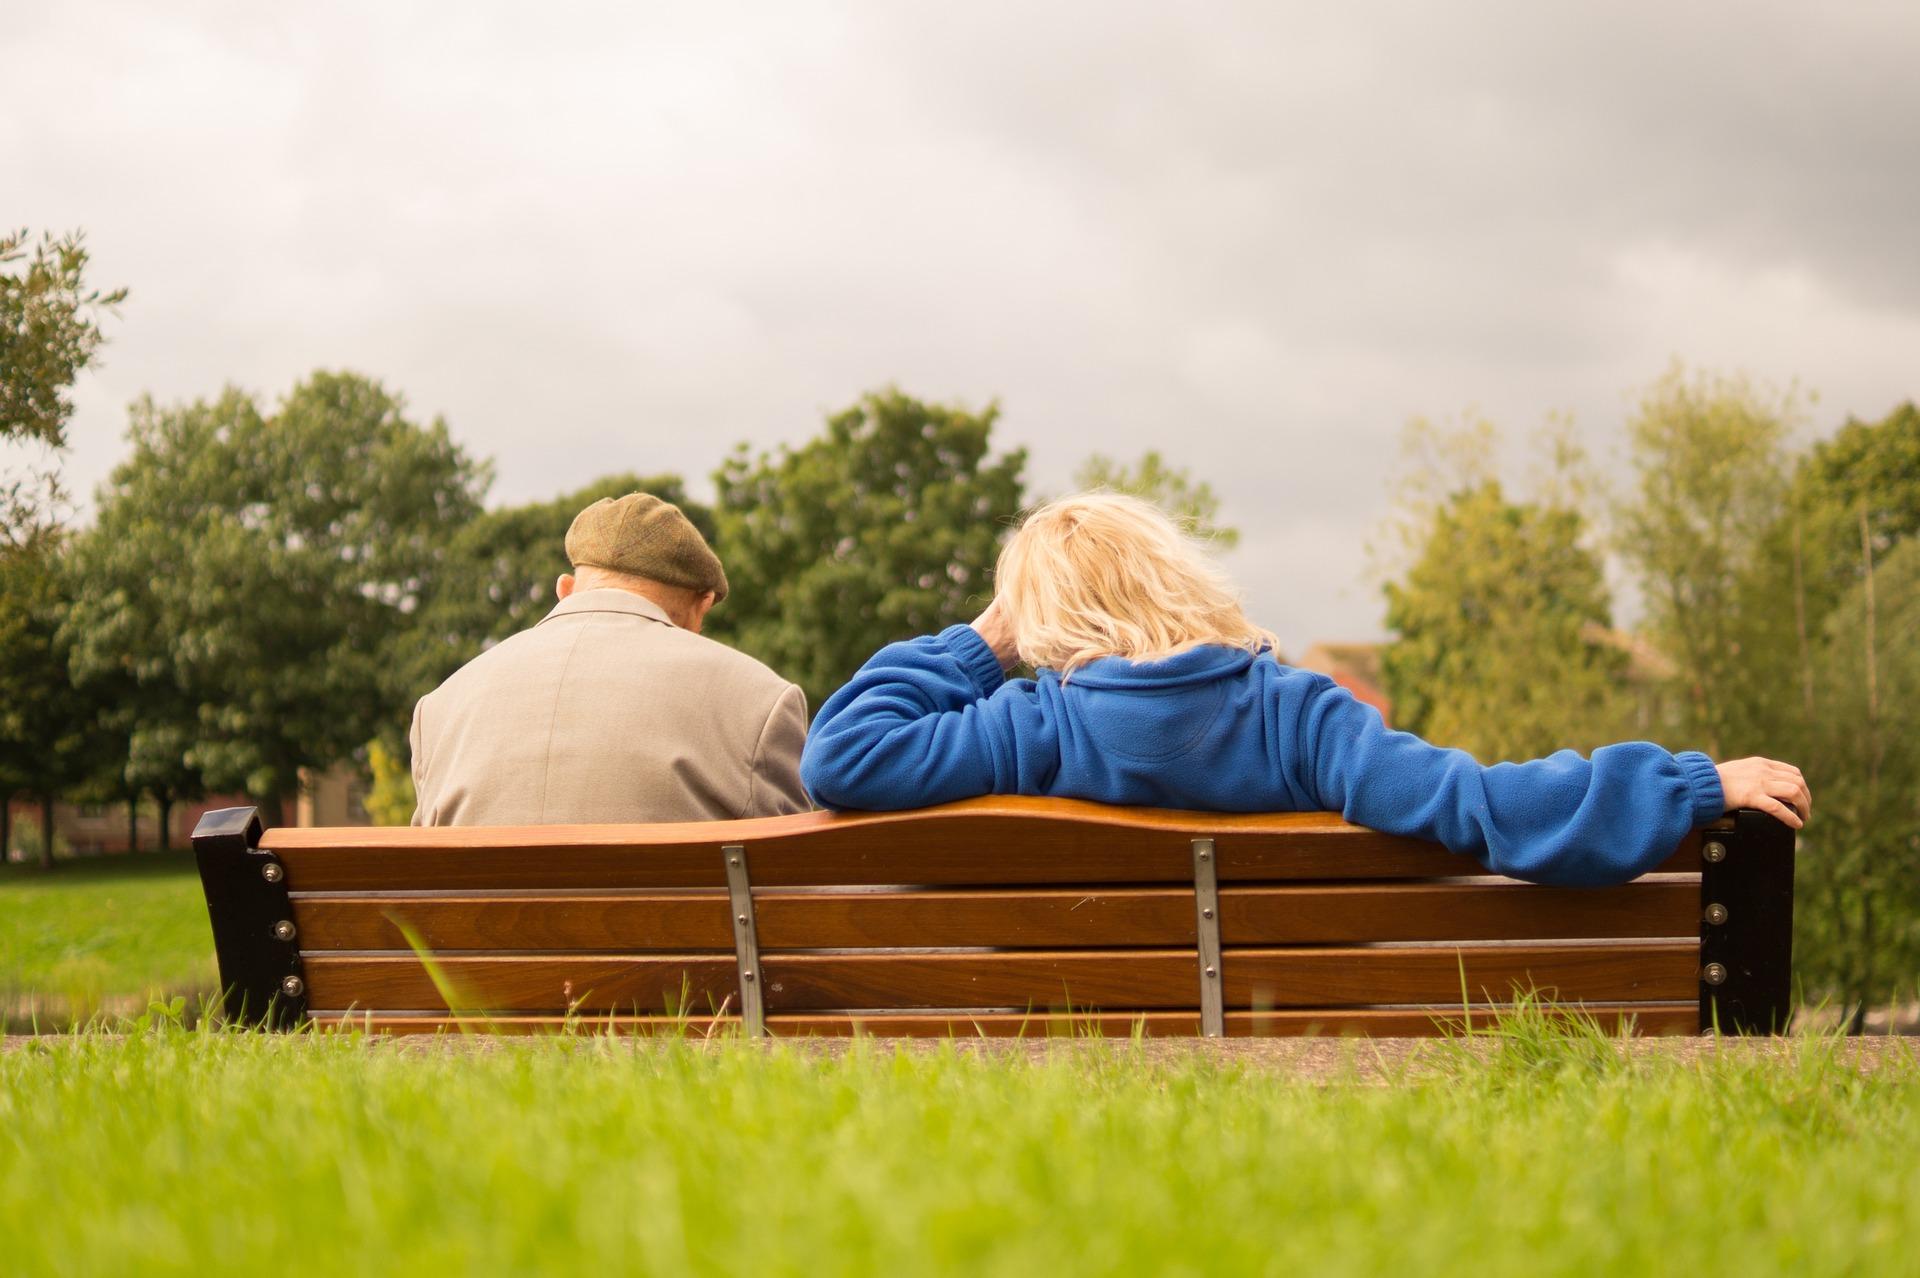 Elderly on a park bench